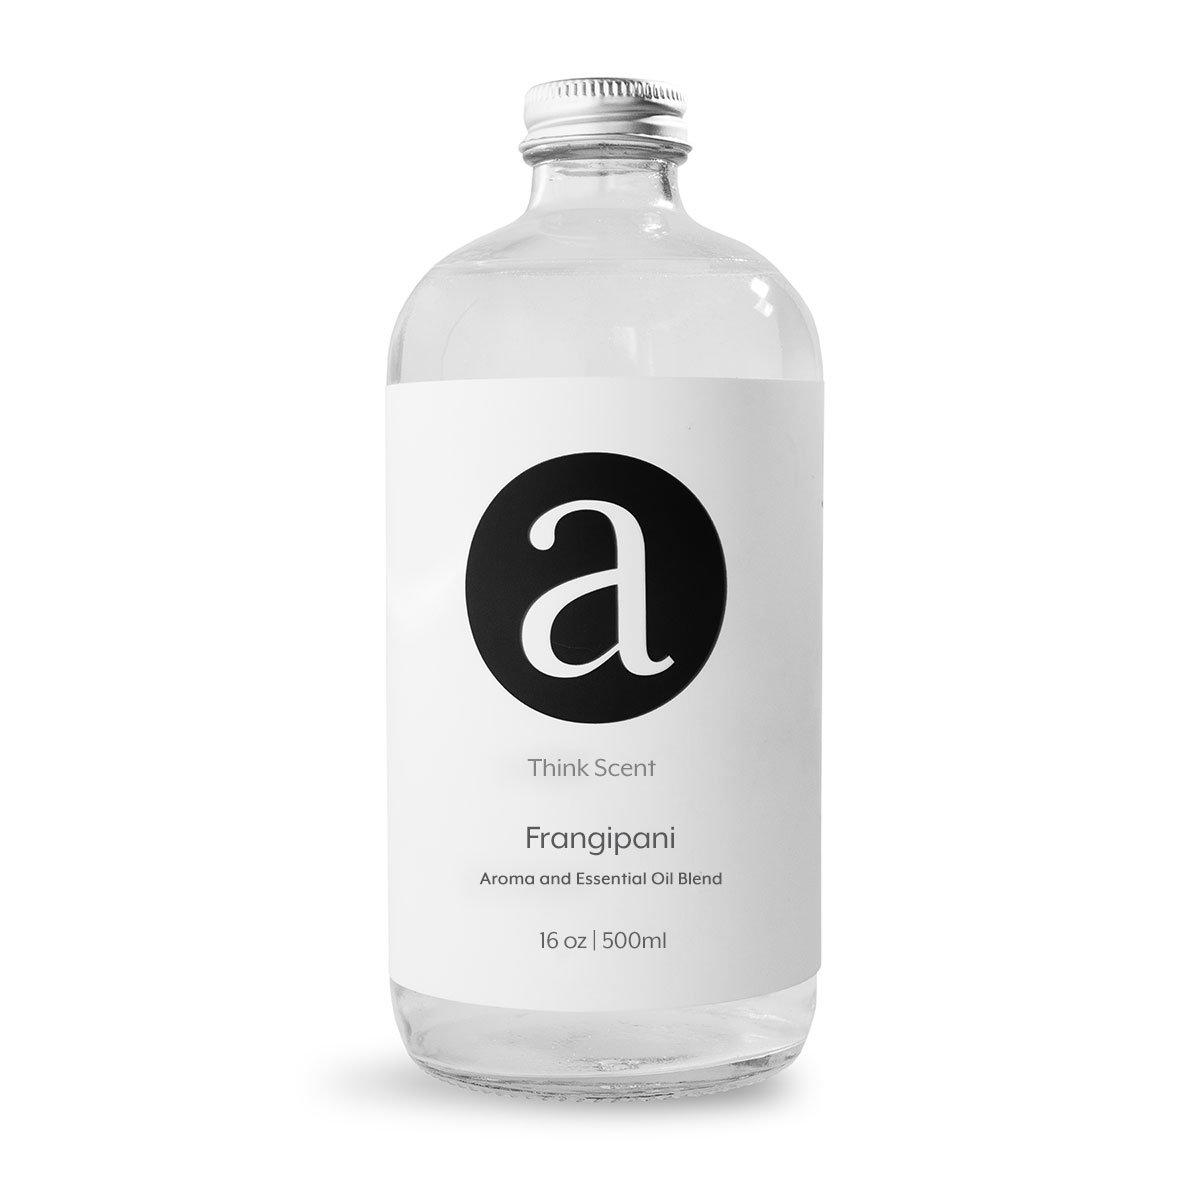 (Frangipani) Aroma / Fragrance Oil For AromaTech Air Freshener Scent Diffuser (500ml)